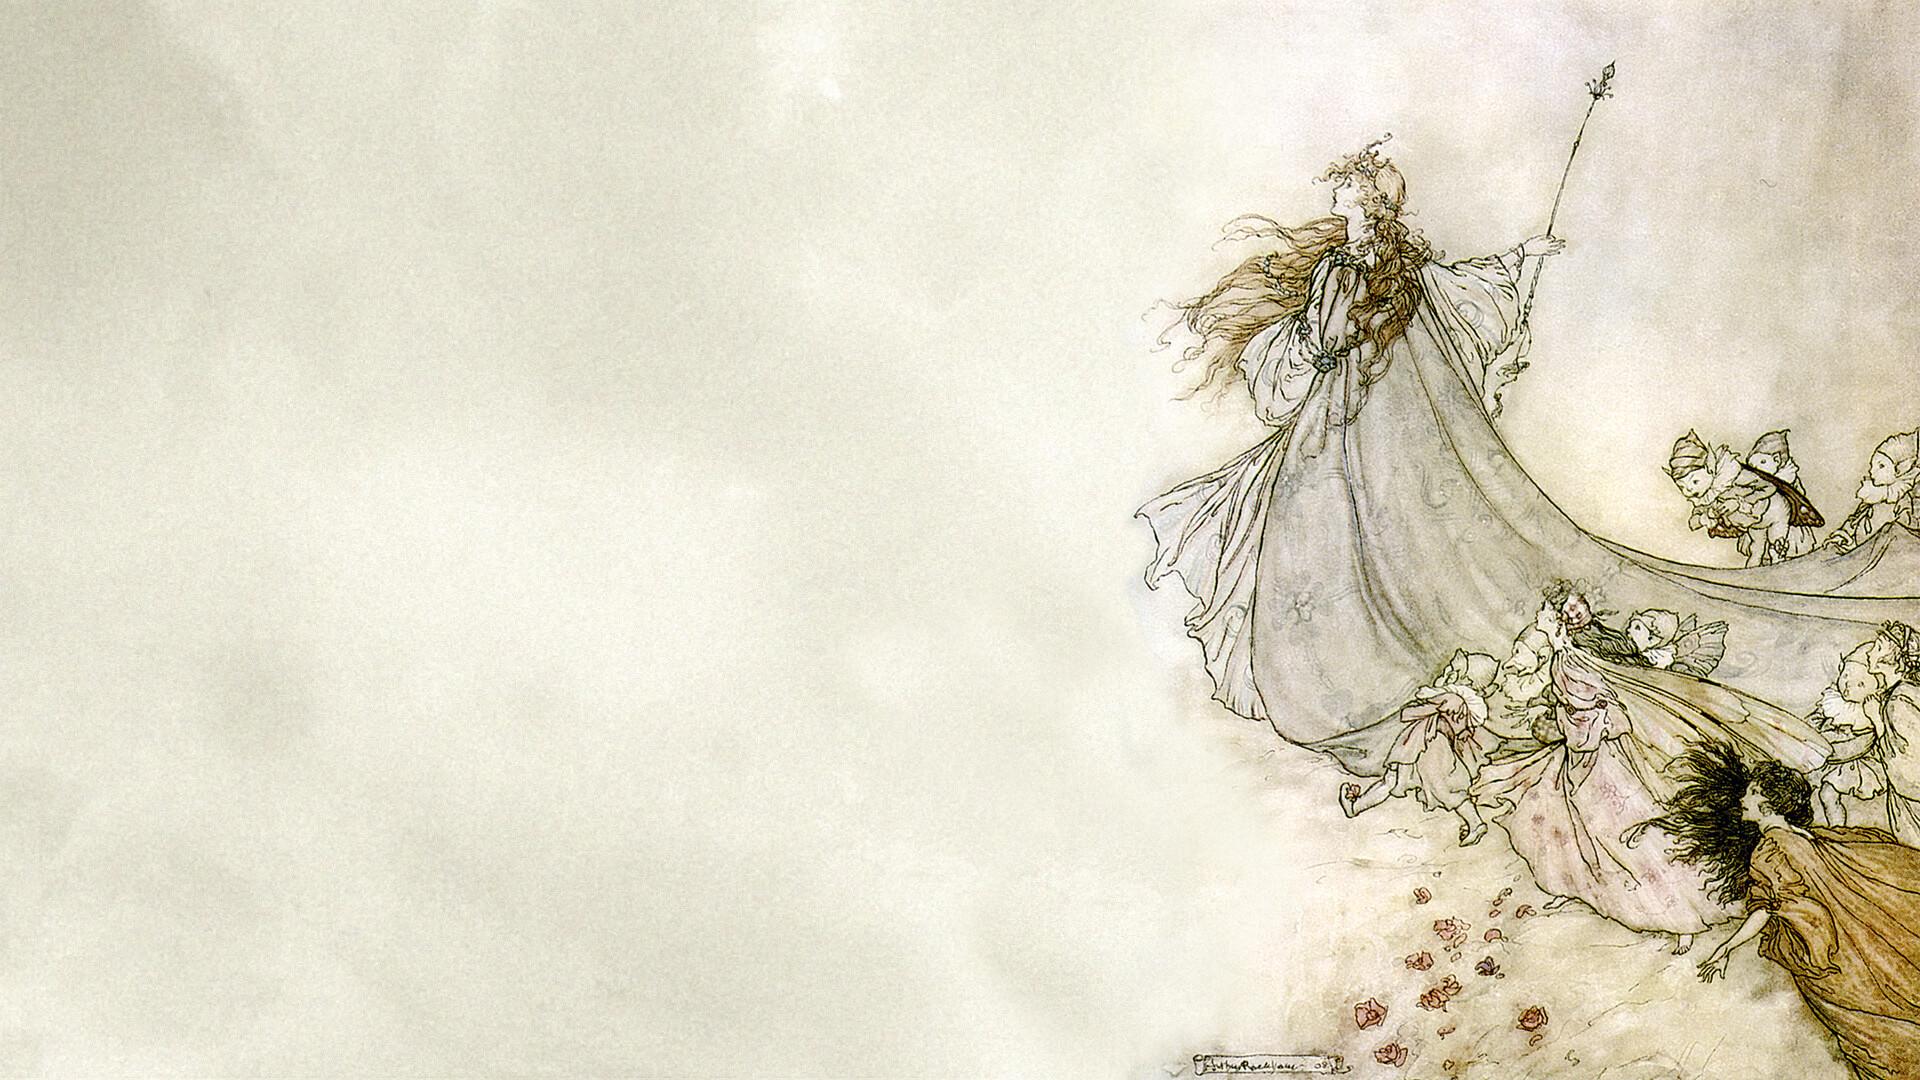 Arthur Rackham-Fairies away! We shall chide downright, if I longer stay_1920x1080